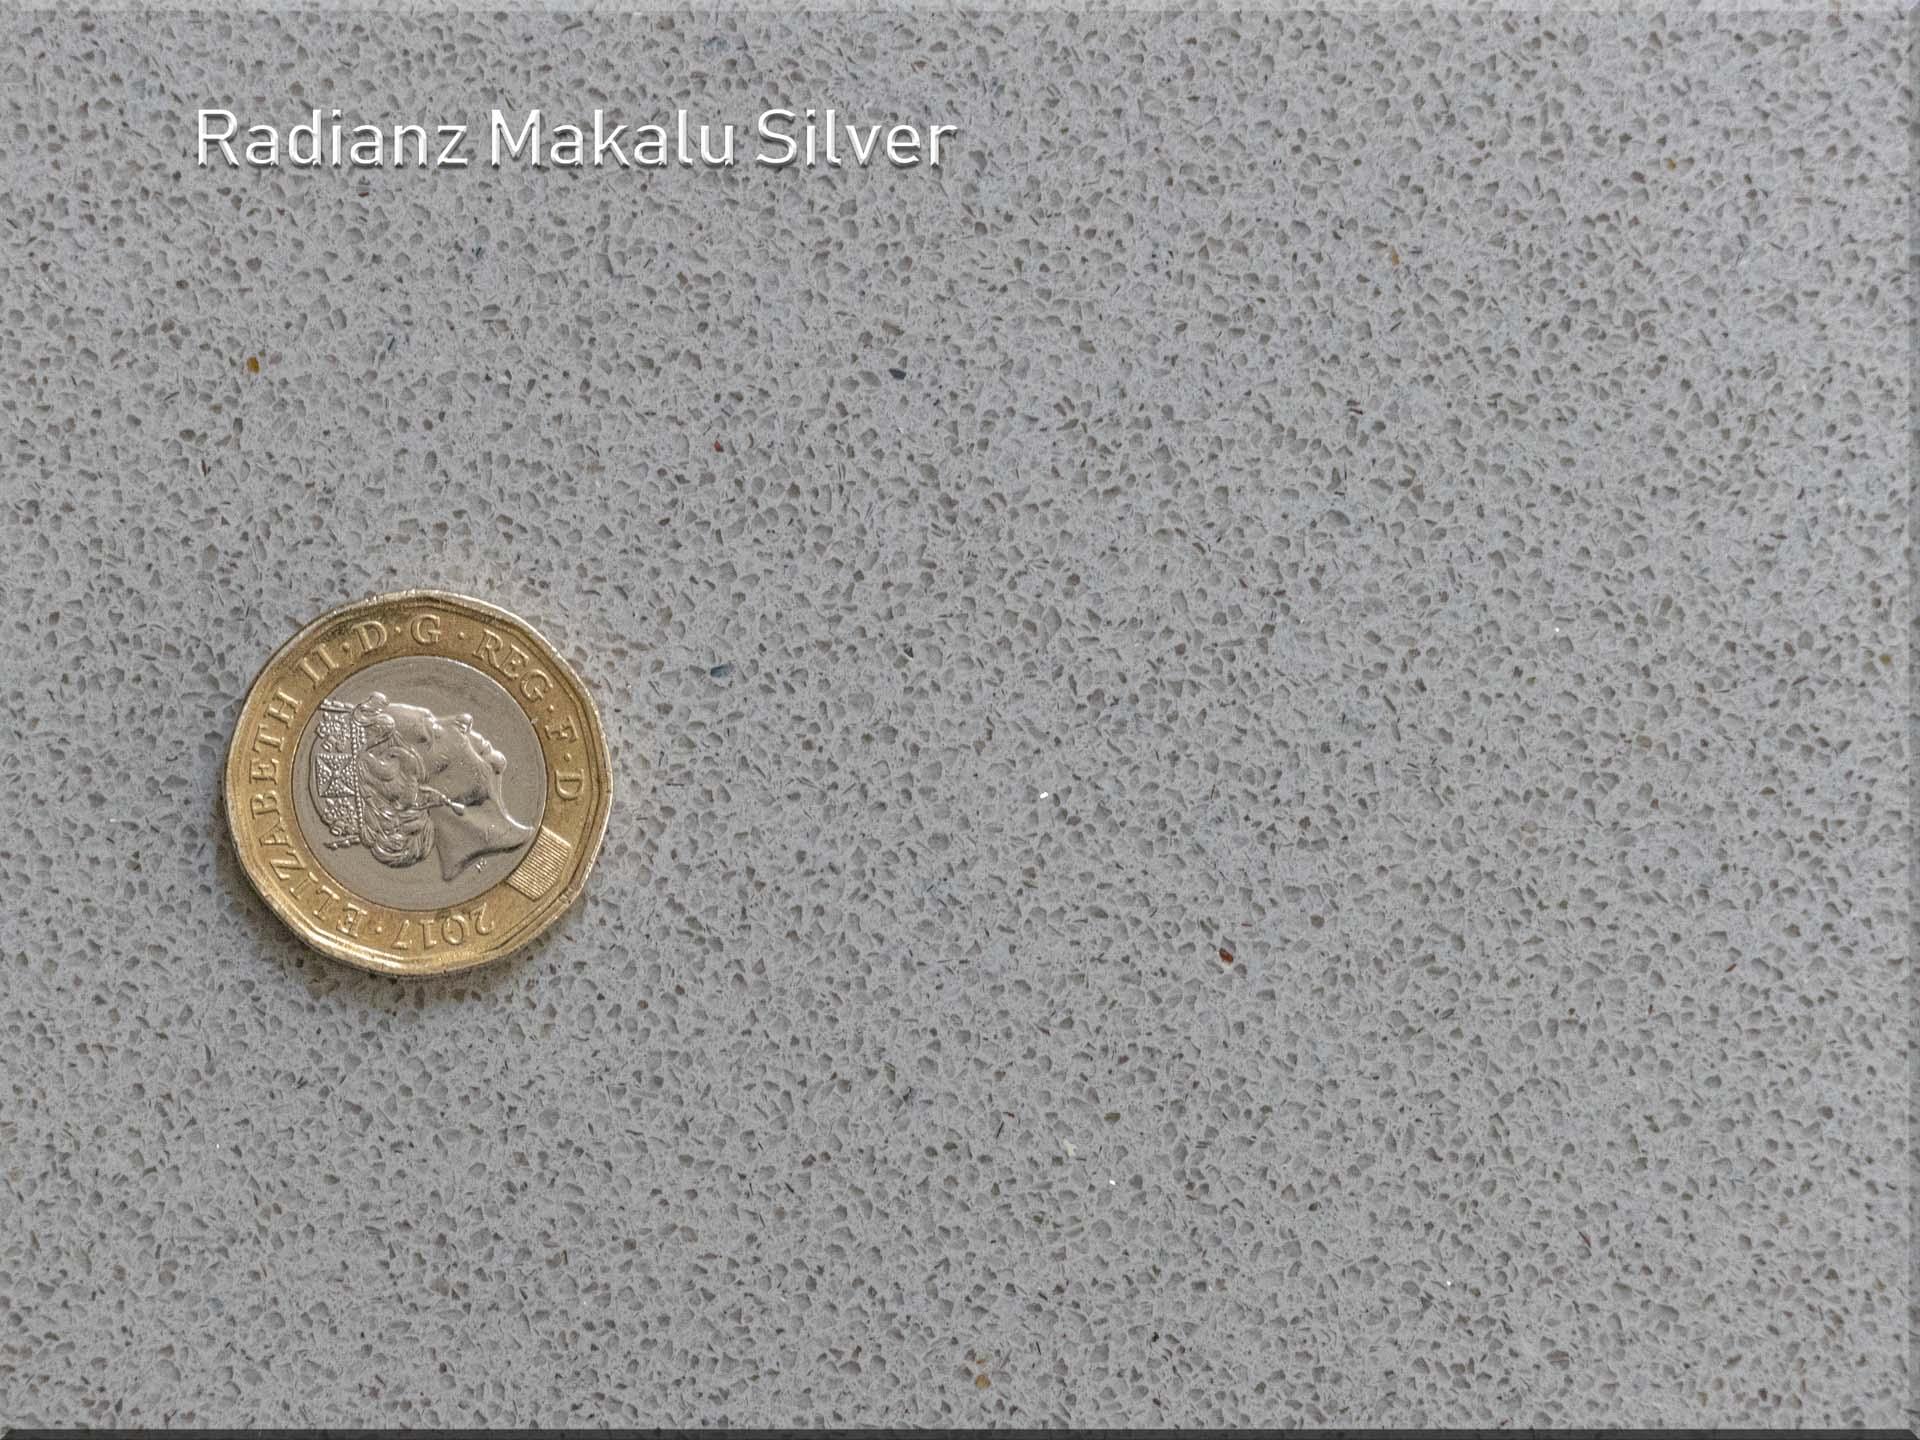 radianz makalu silver small sparkly quartz worktops subtle special offer july 2019 164026